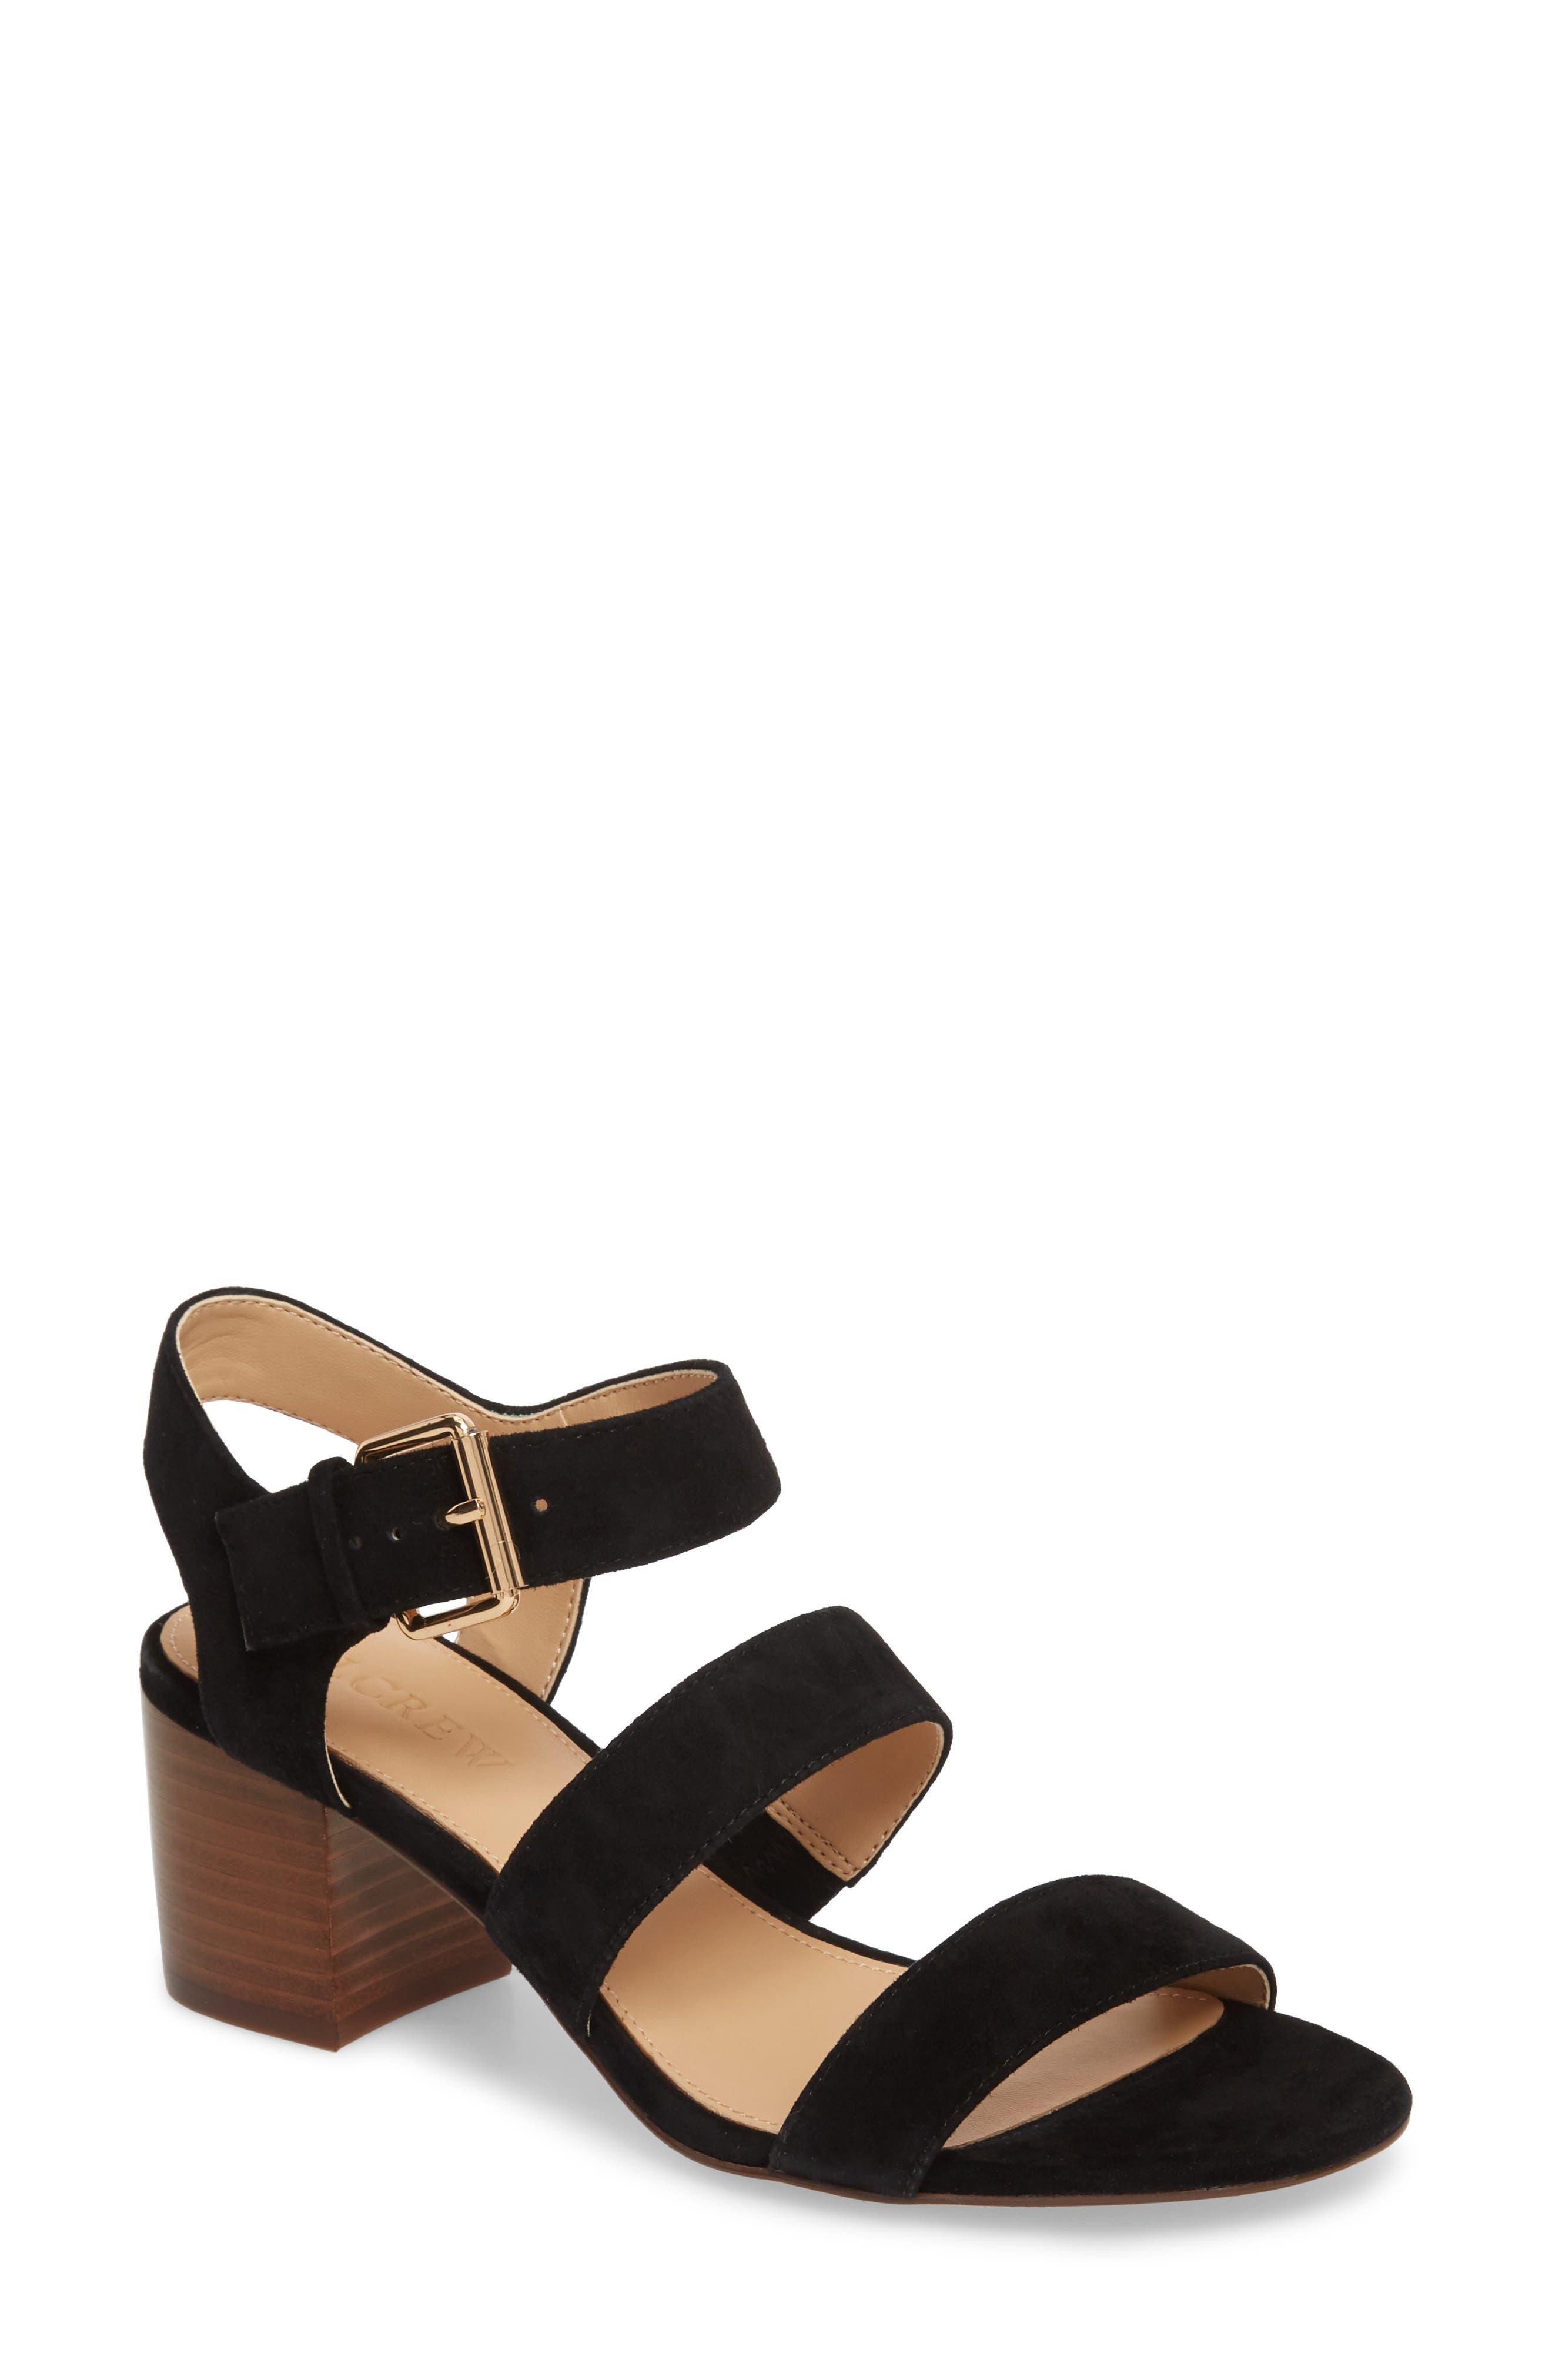 Three-Strap Suede Sandal,                         Main,                         color, Black Suede